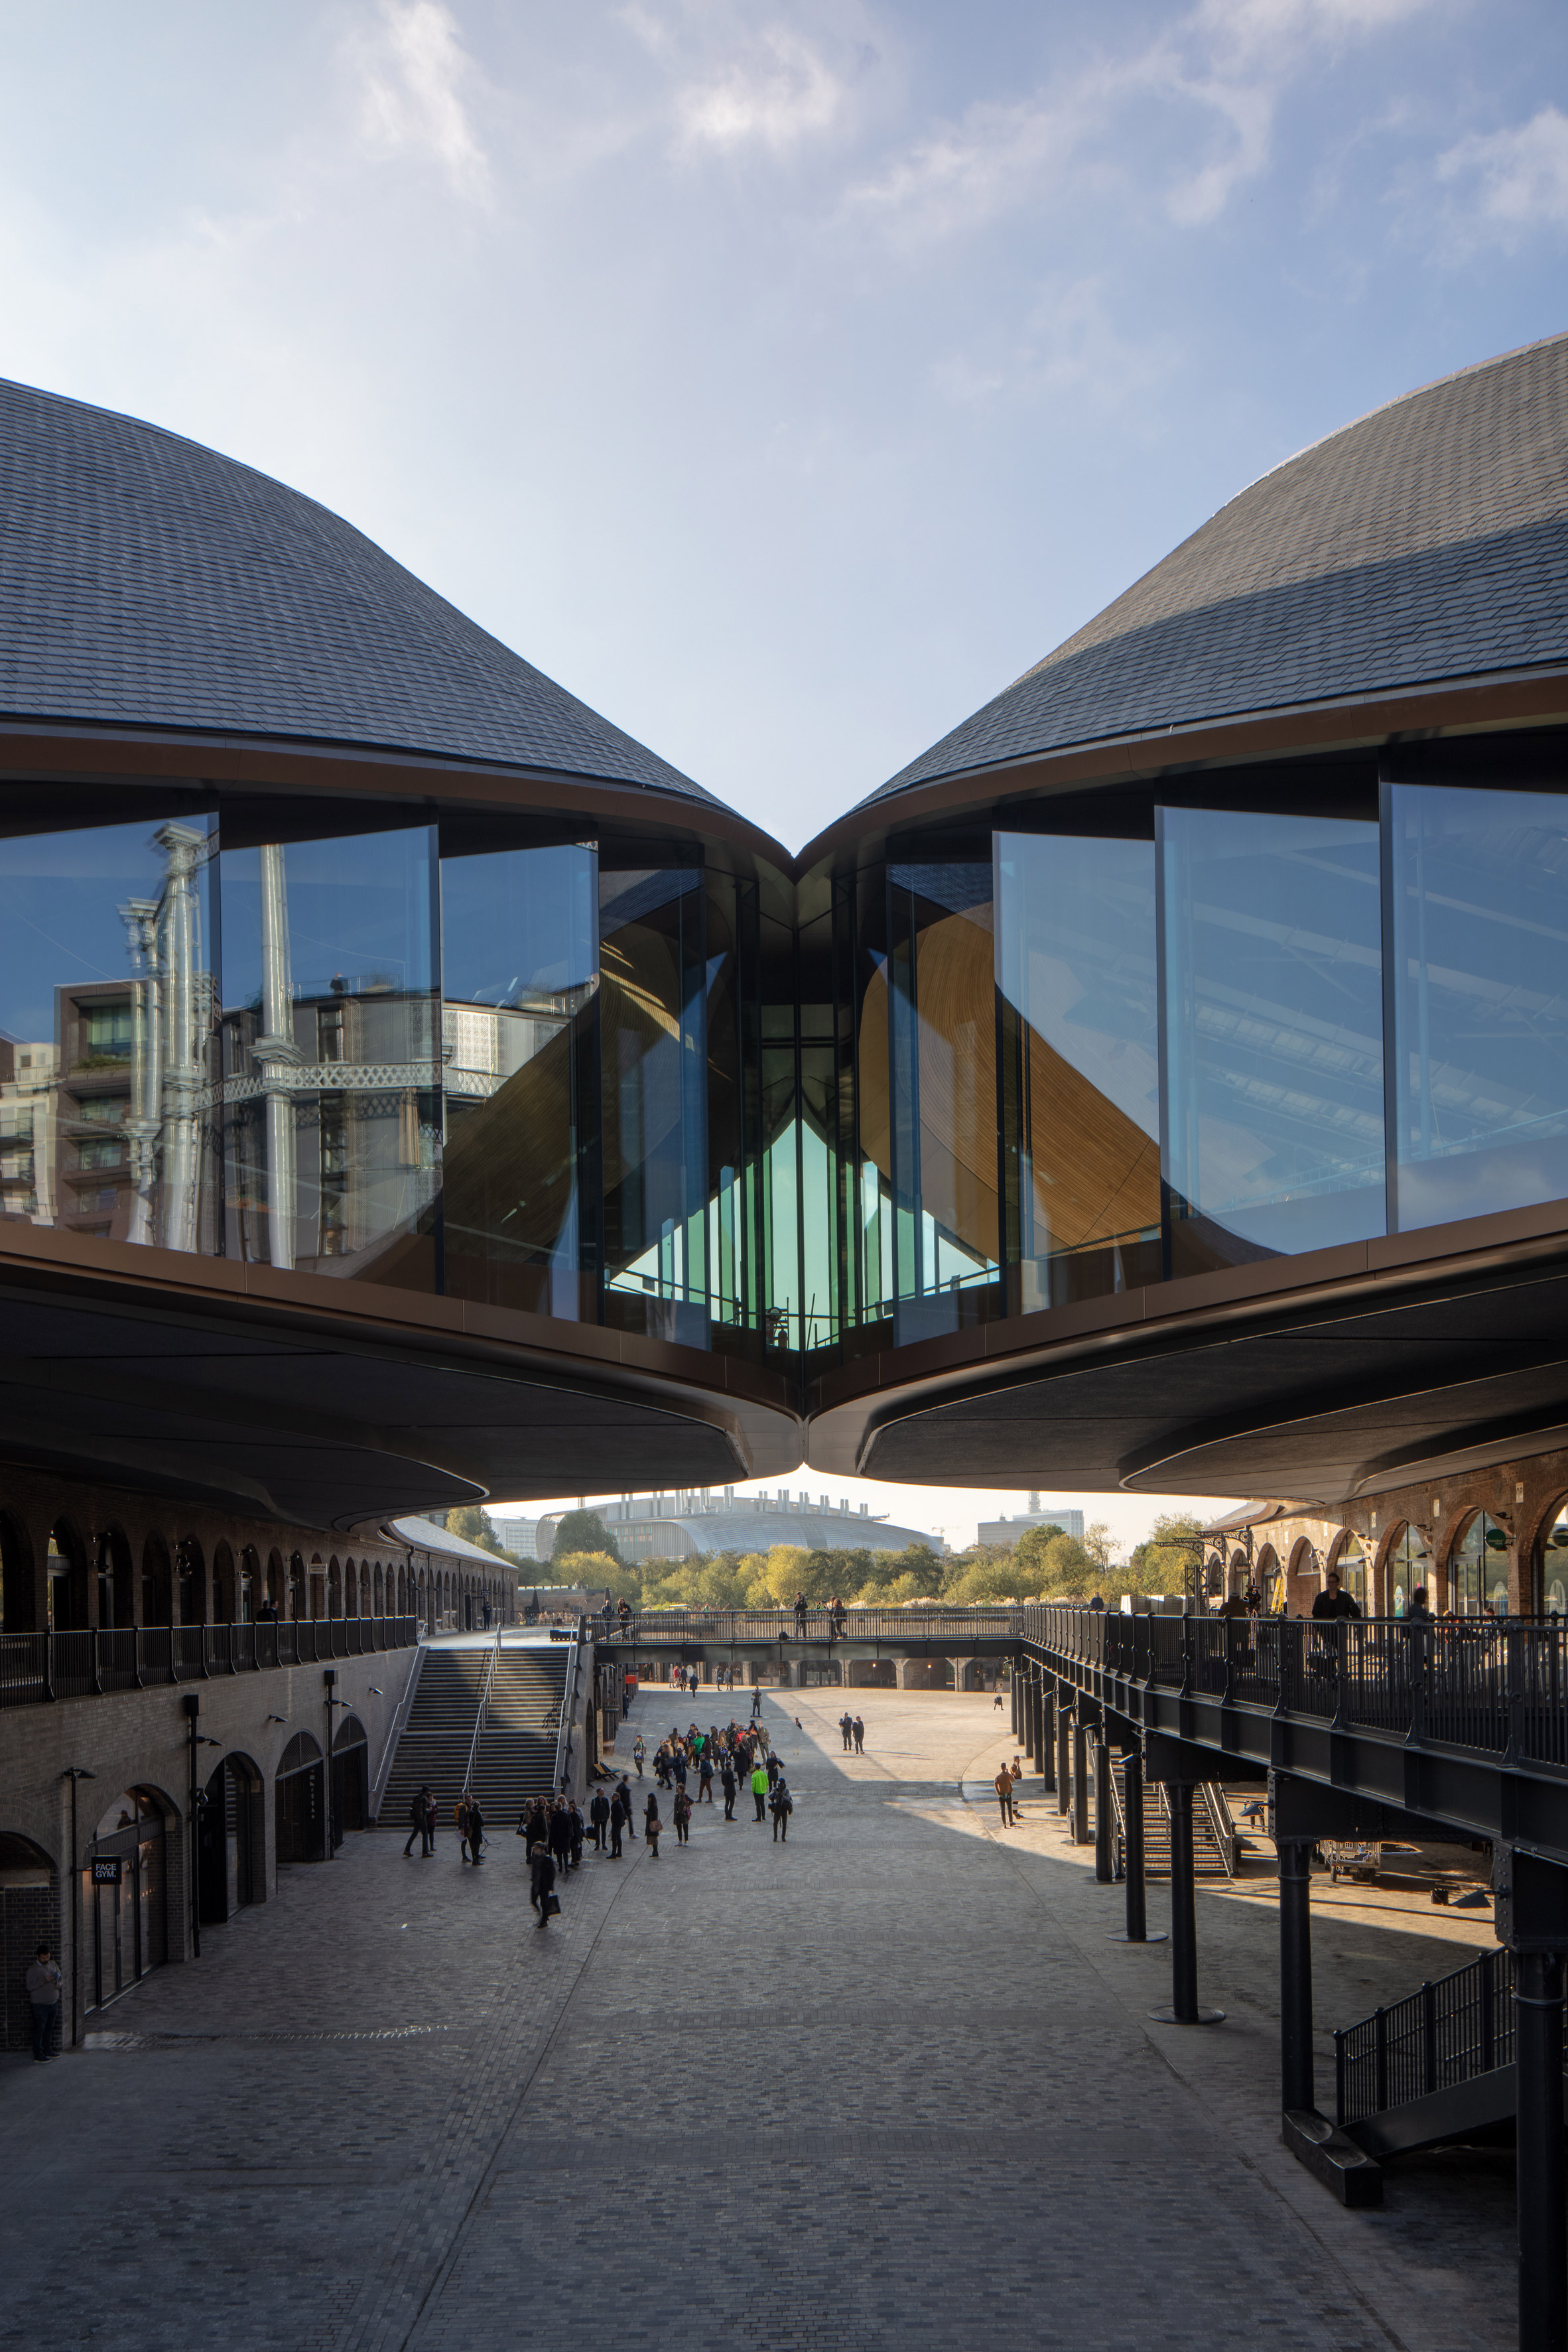 coal-drops-yard-thomas-heatherwick-studio-kings-cross-architecture_dezeen_2364_col_10